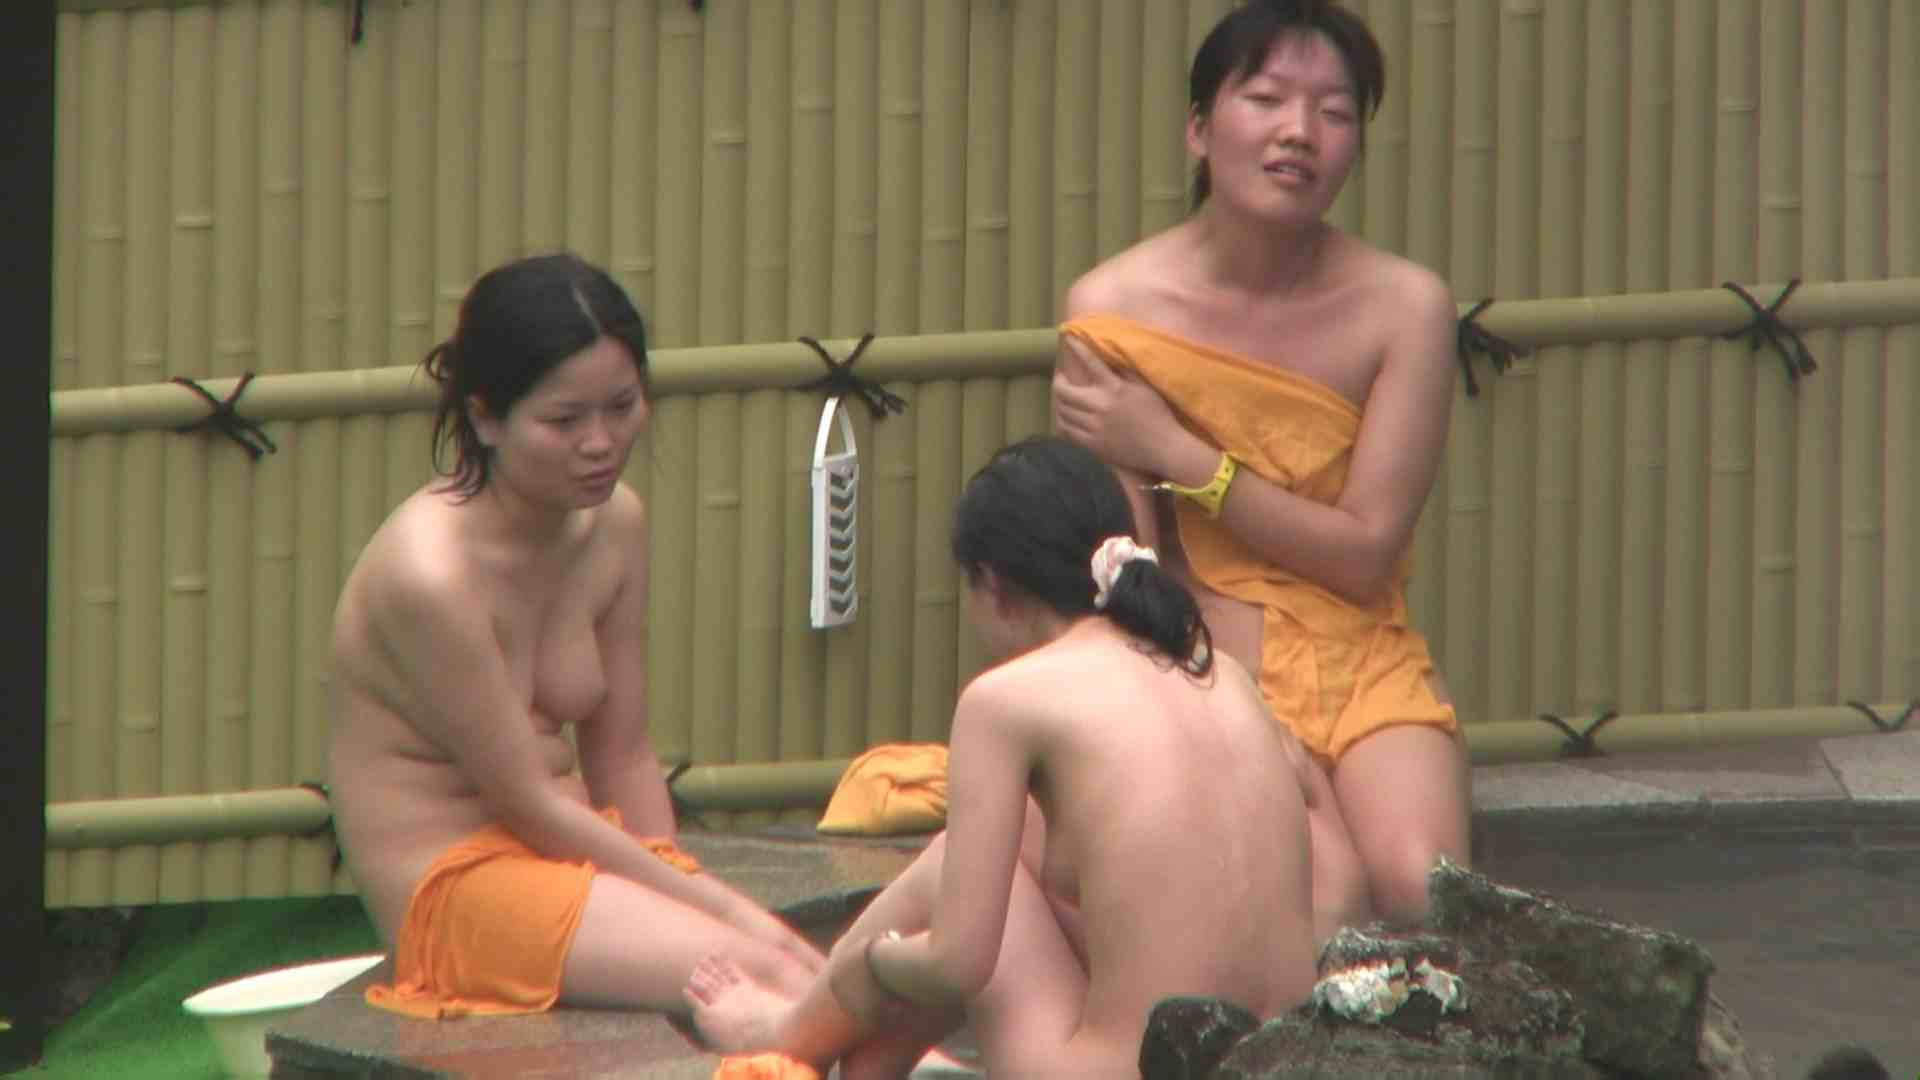 Aquaな露天風呂Vol.73【VIP限定】 盗撮 | HなOL  54pic 38